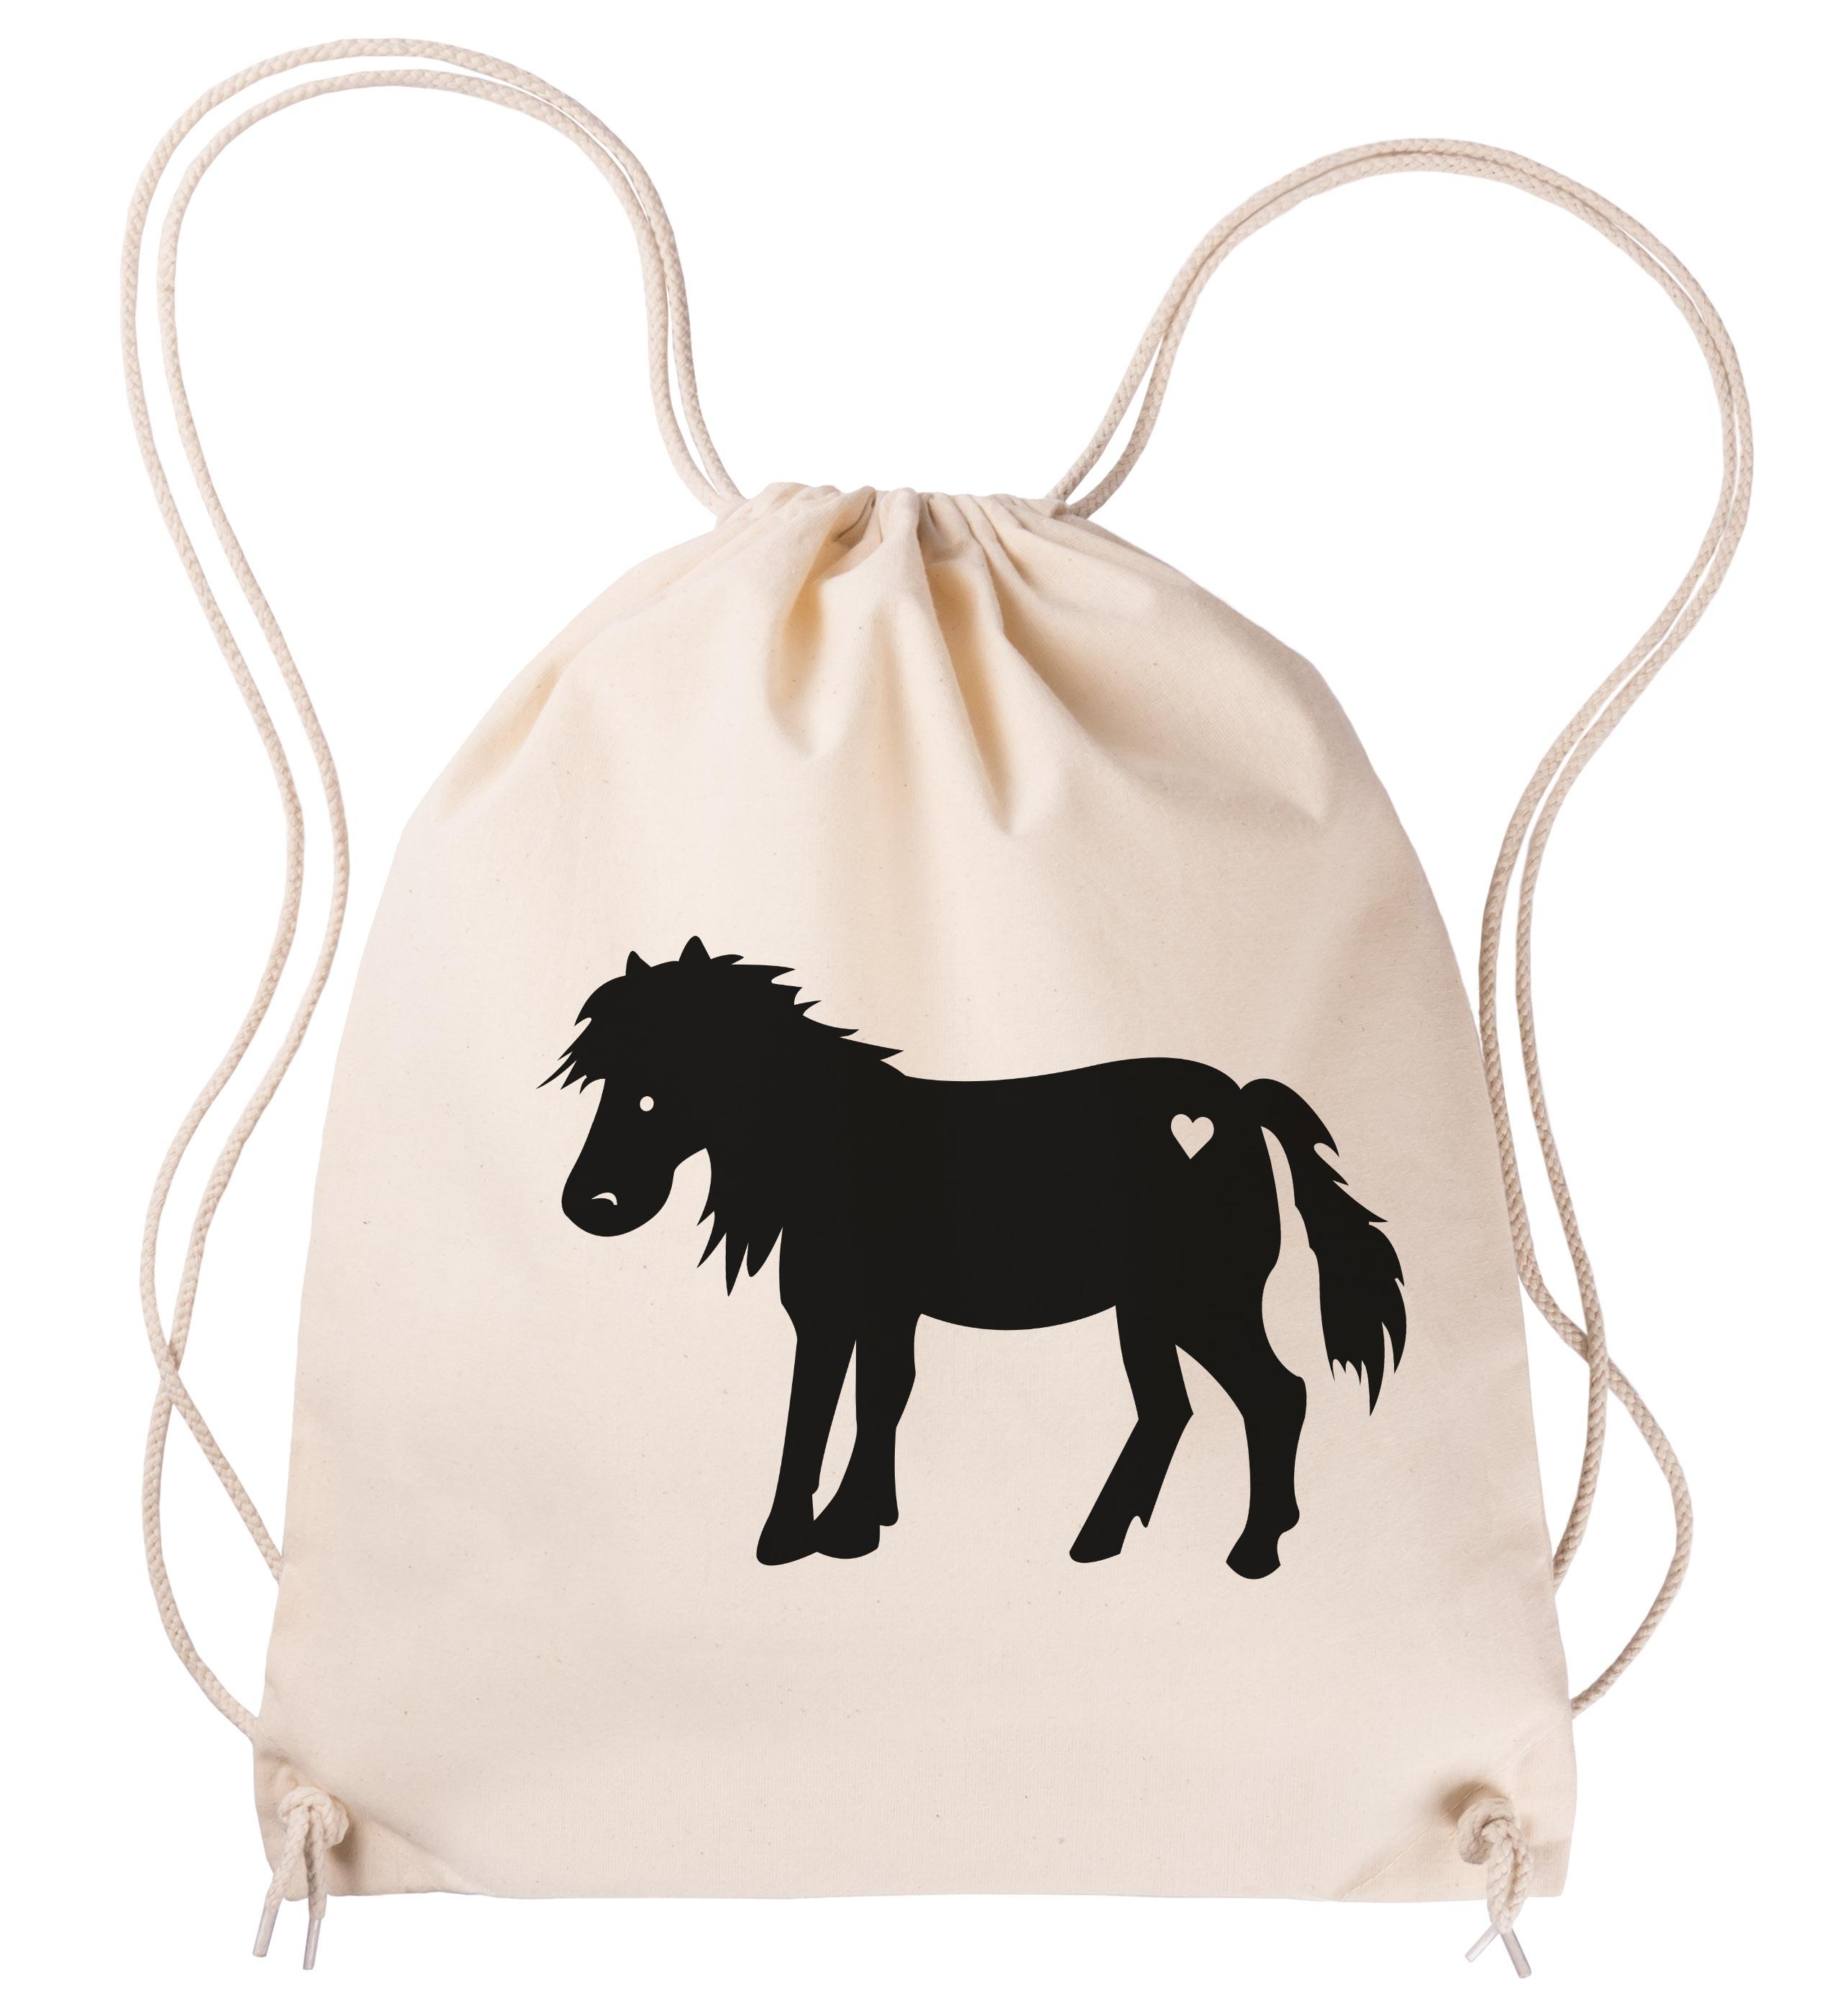 Sportbeutel Pony aus Baumwolle